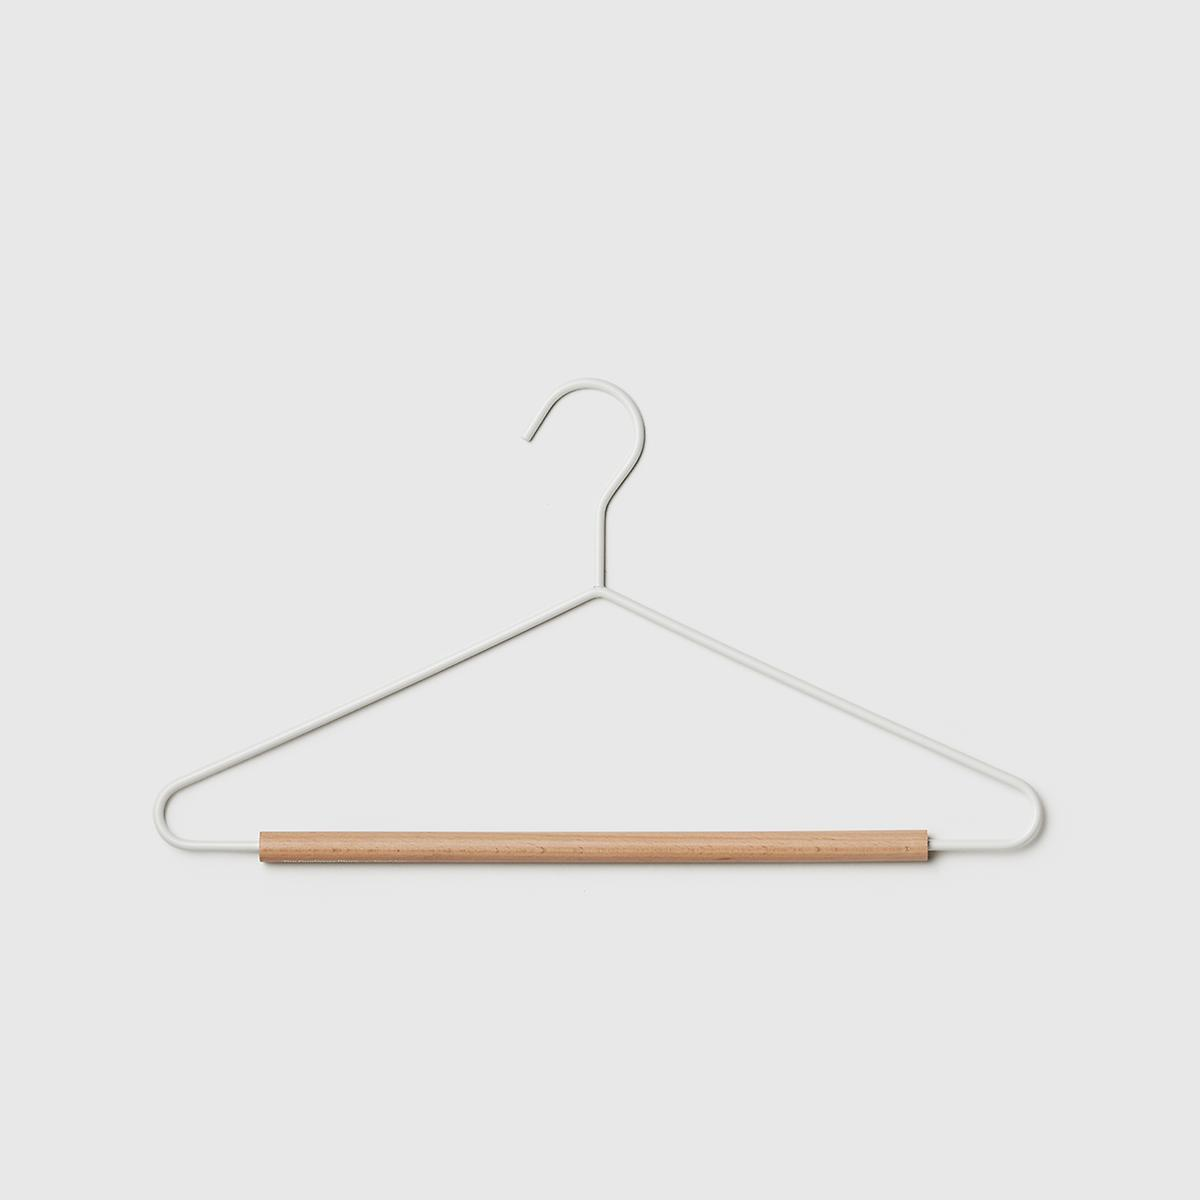 Marie Kondo Cloud White Serene Matte Metal Suit Hanger